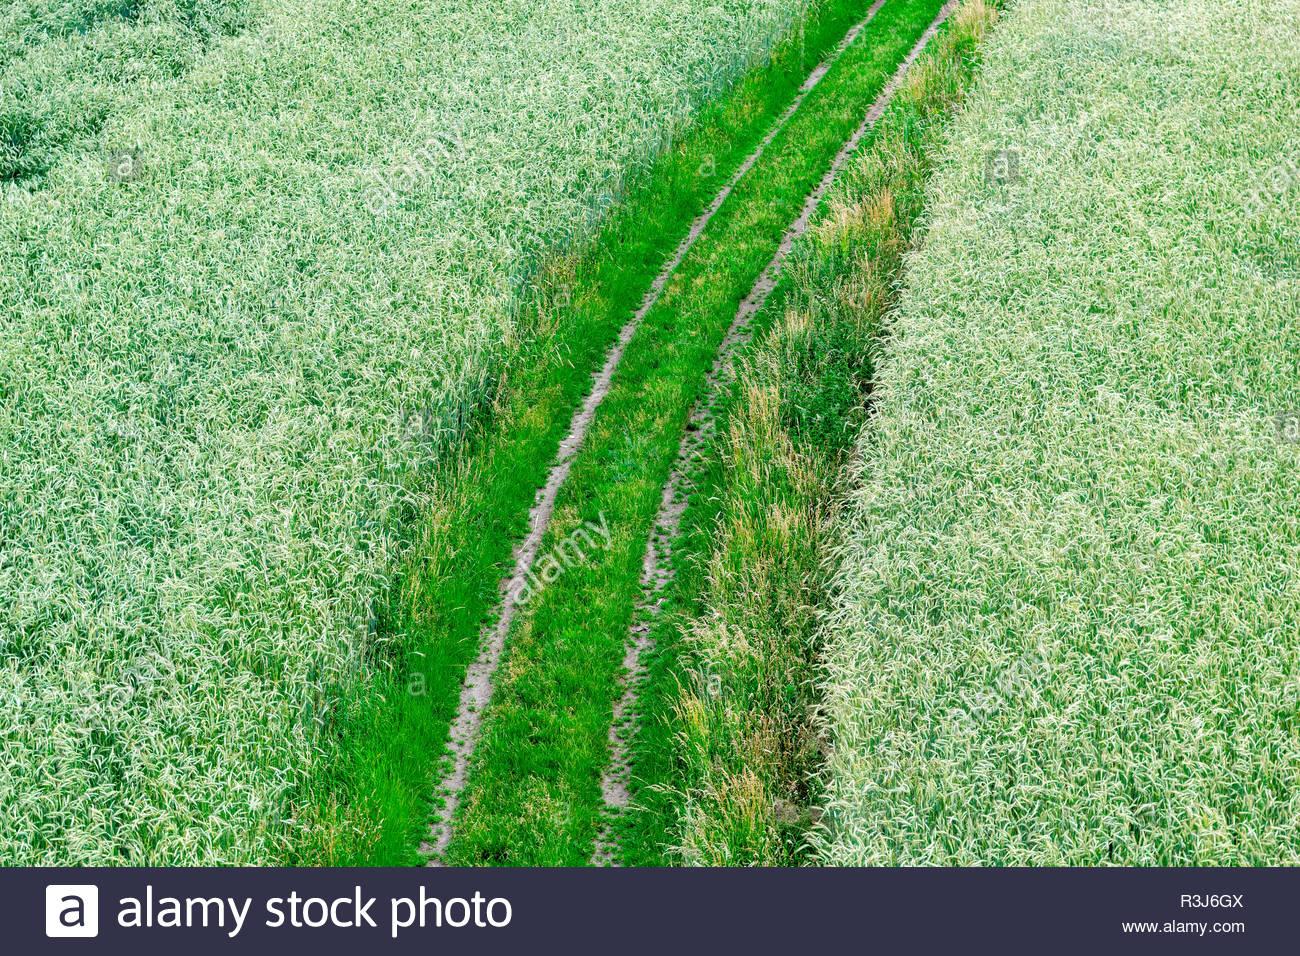 Feldweg aus der Luft - Stock Image